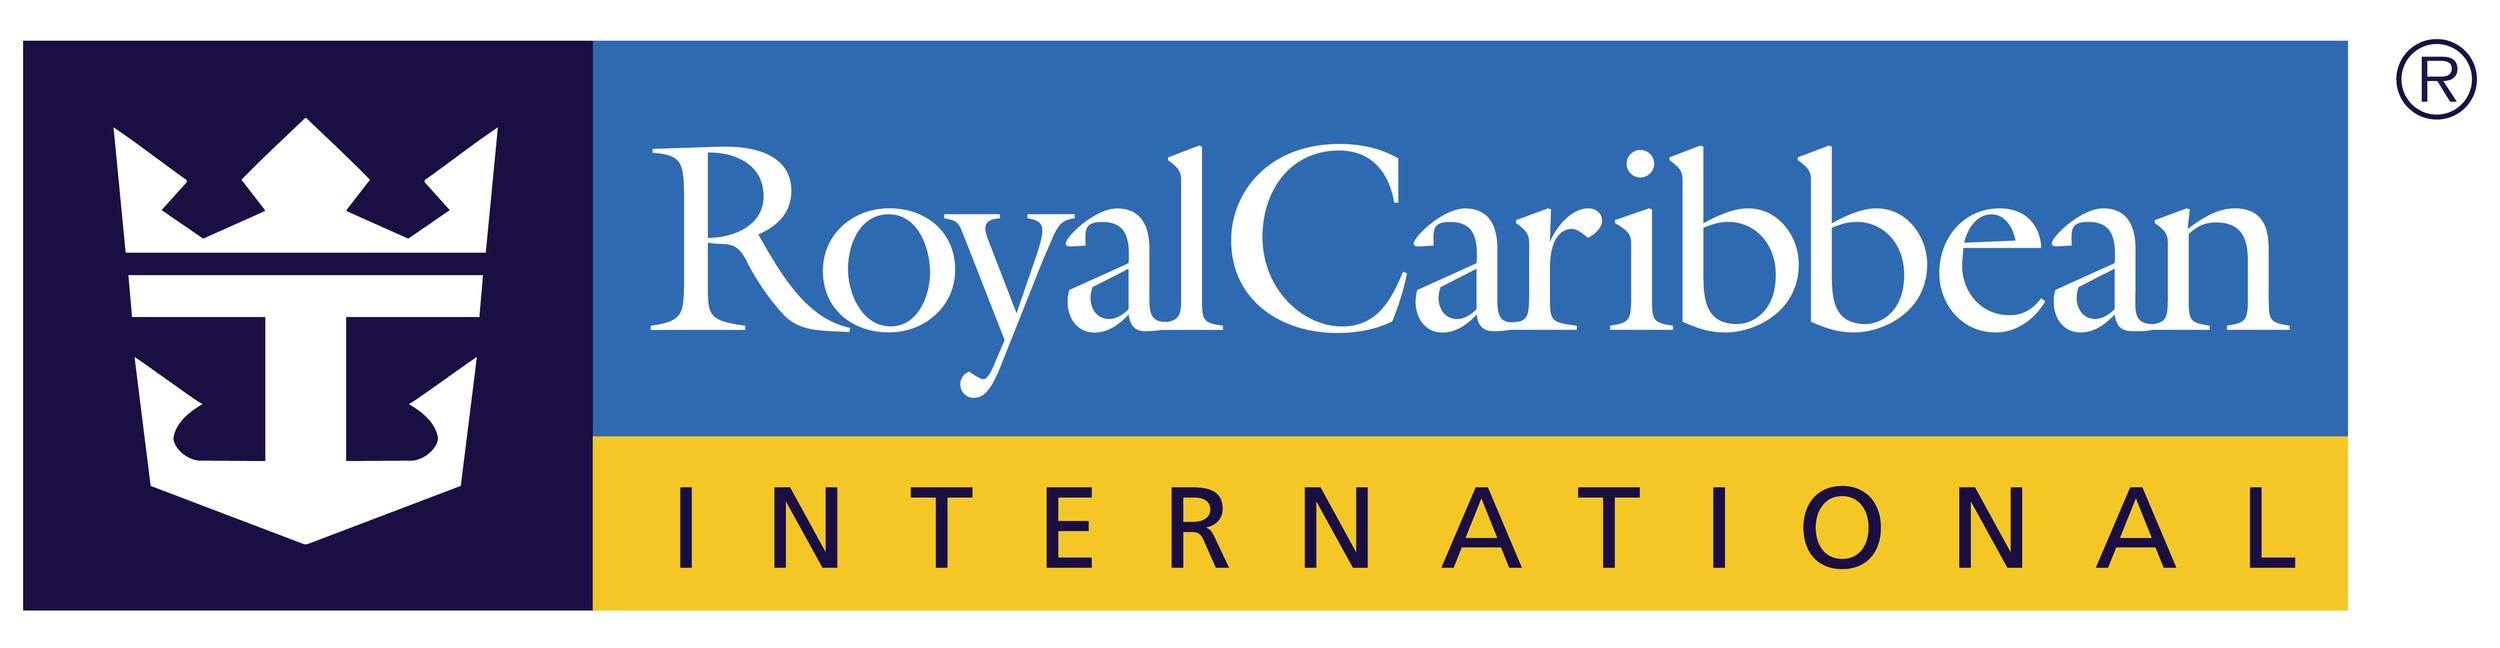 royalcaribbean_logo1.jpg